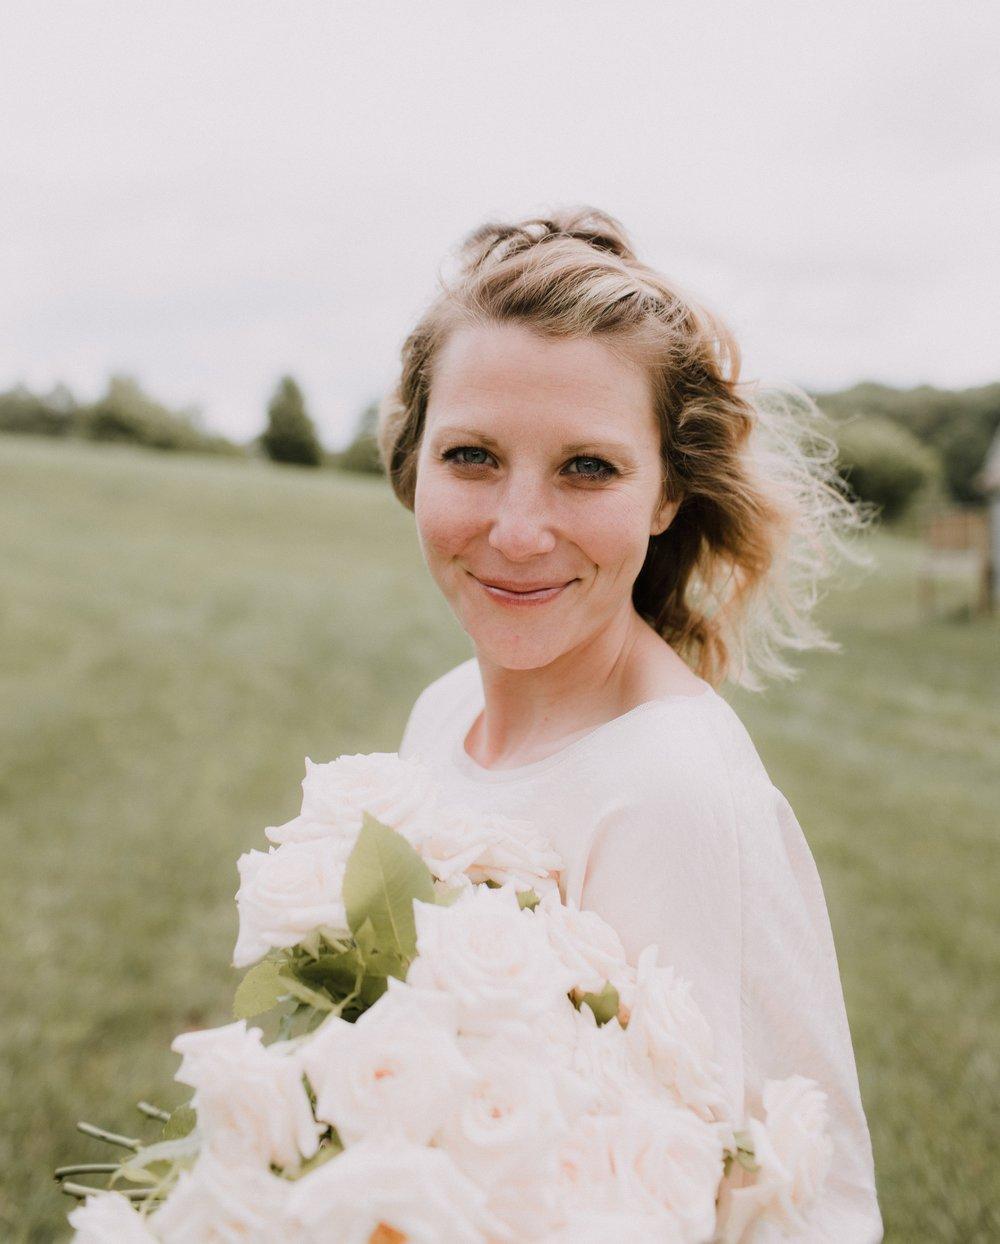 Becca Olcott, Blossom & Vine wedding flowers, washington, DC